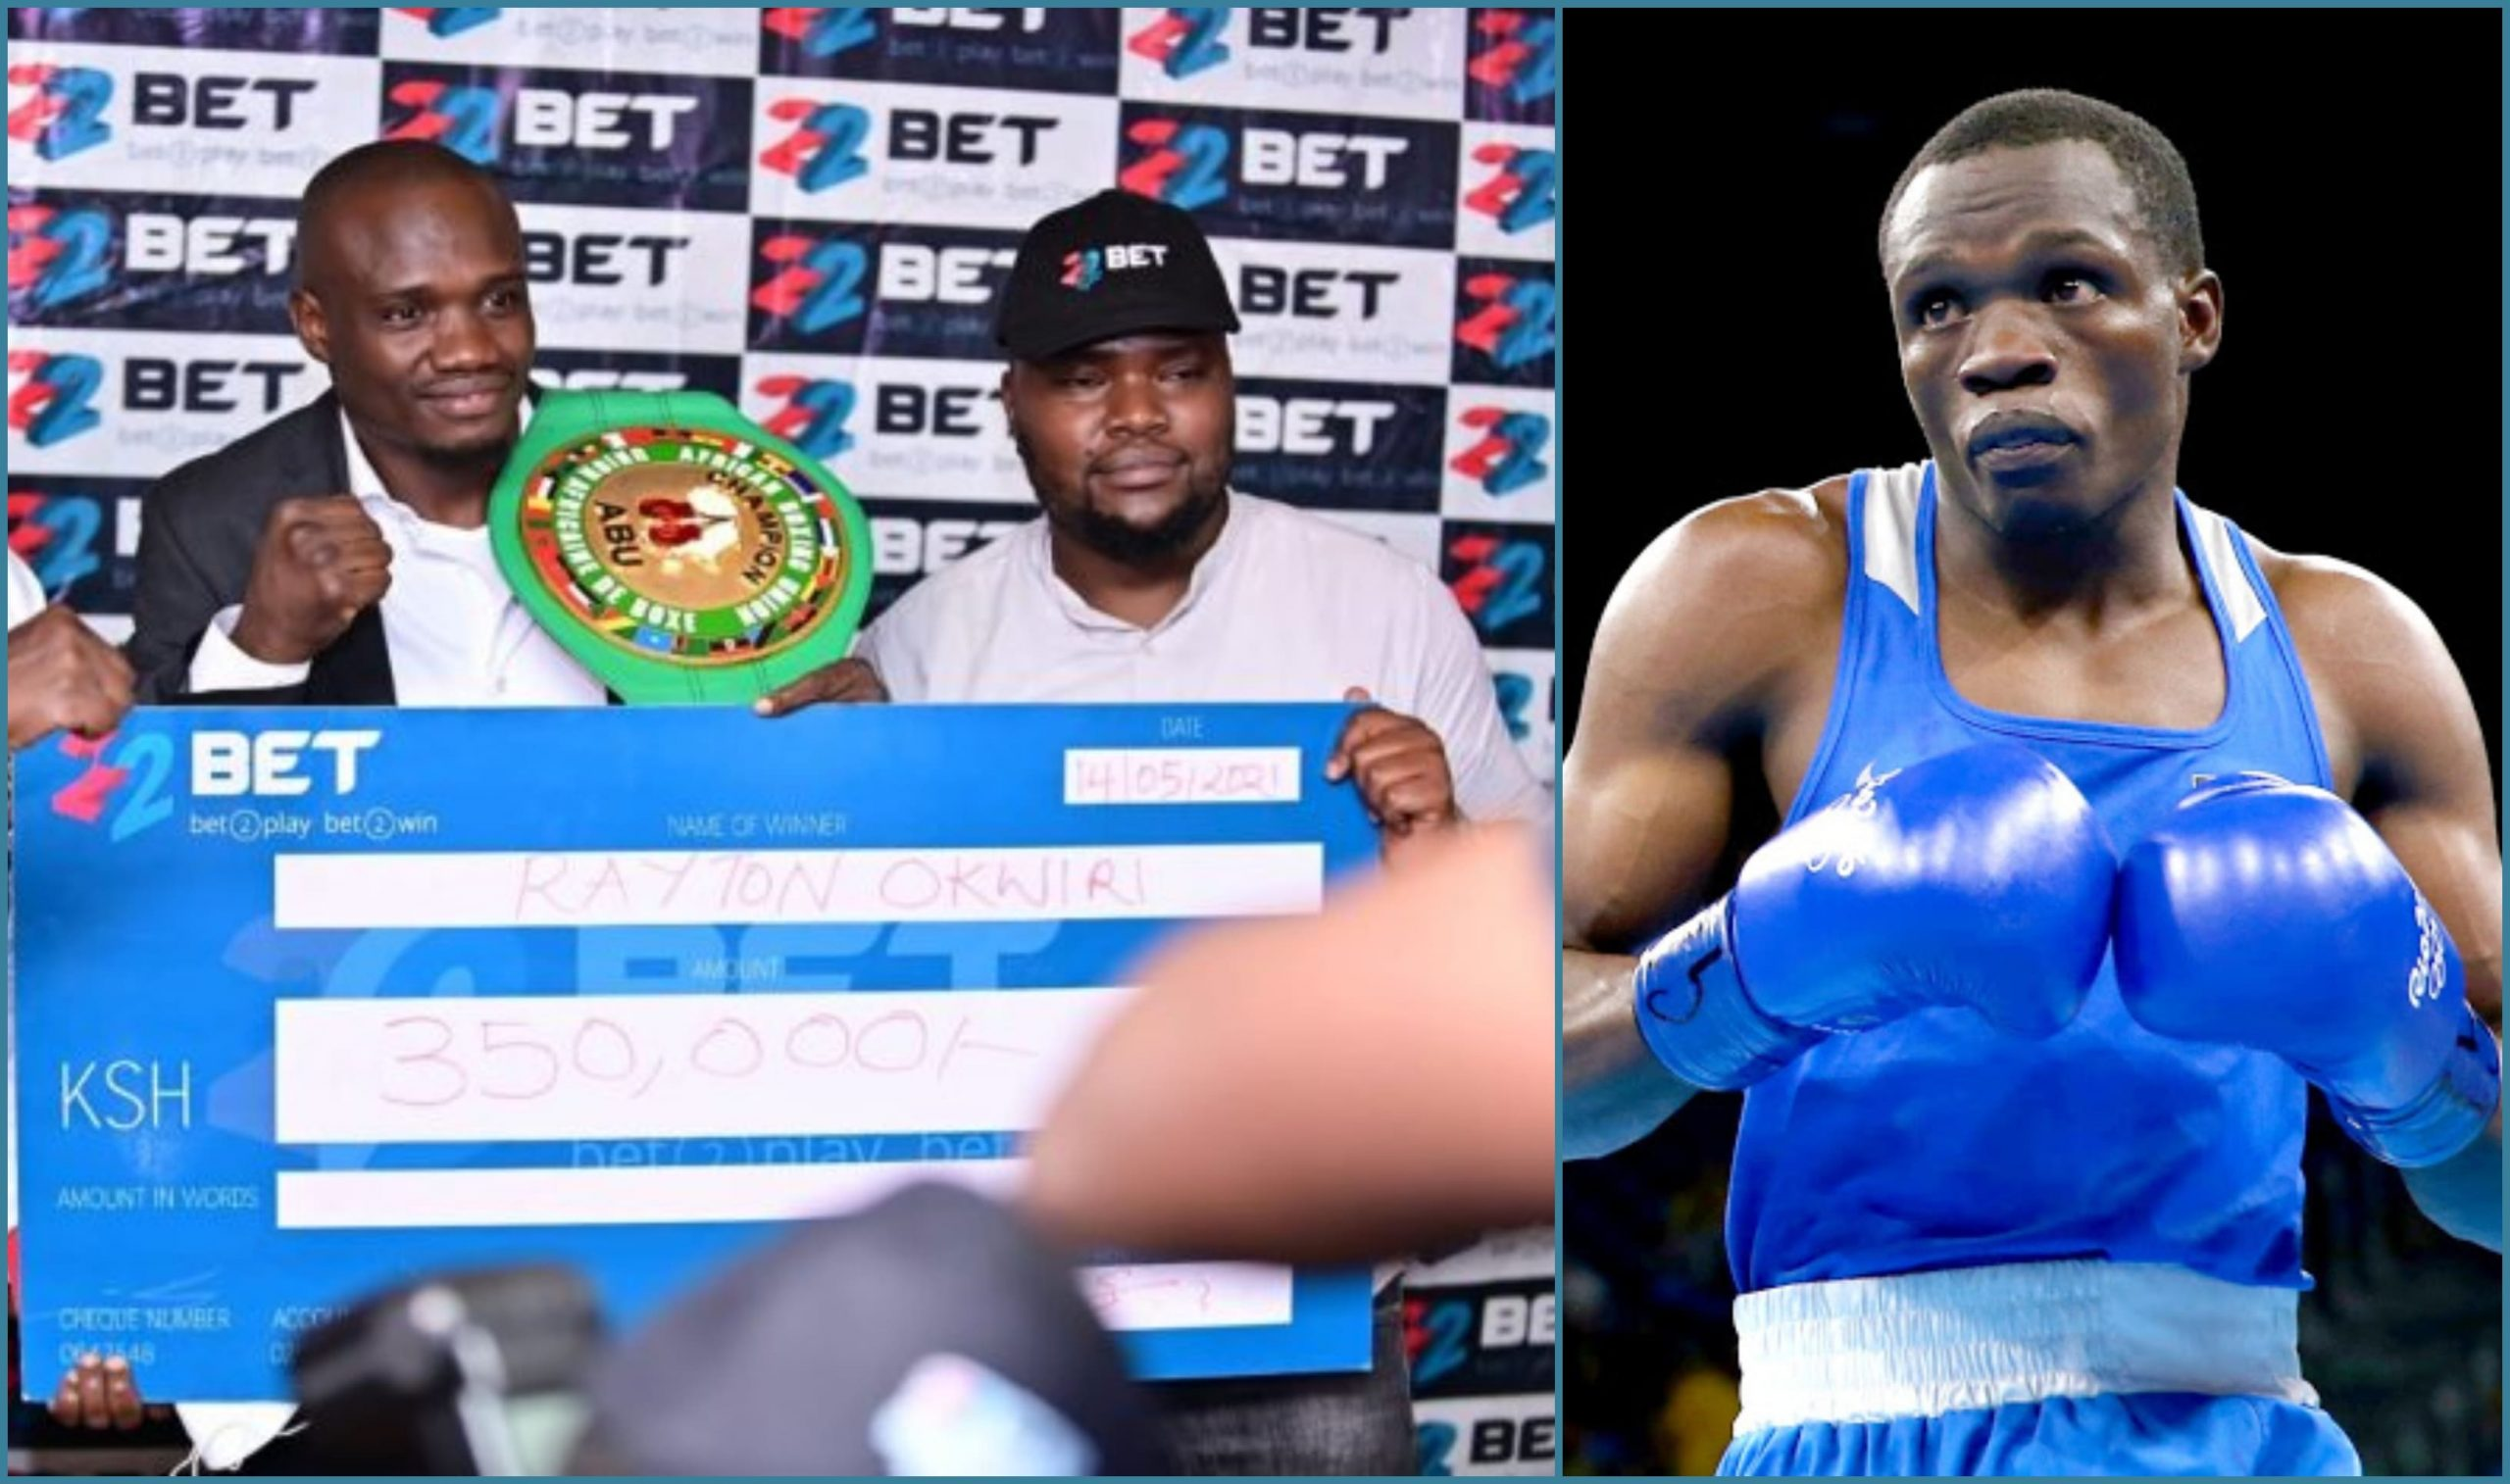 22Bet Sponsors African Boxing Champion Rayton Okwiri Ahead of WBO Title Fight